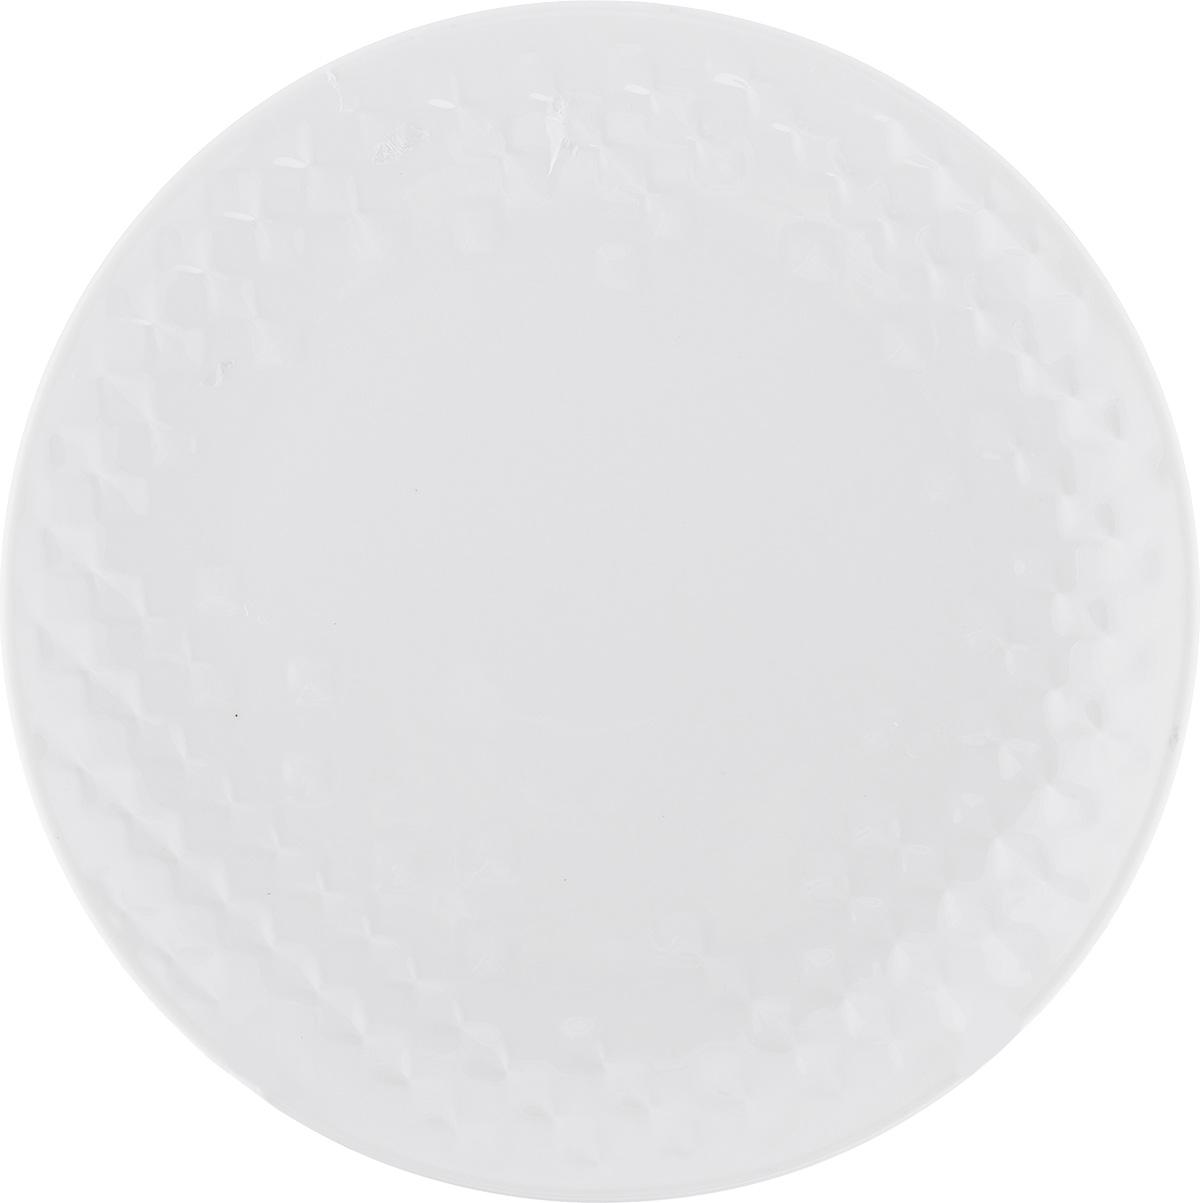 "Тарелка десертная Walmer ""Sapphire"", цвет: белый, диаметр 20,5 см"